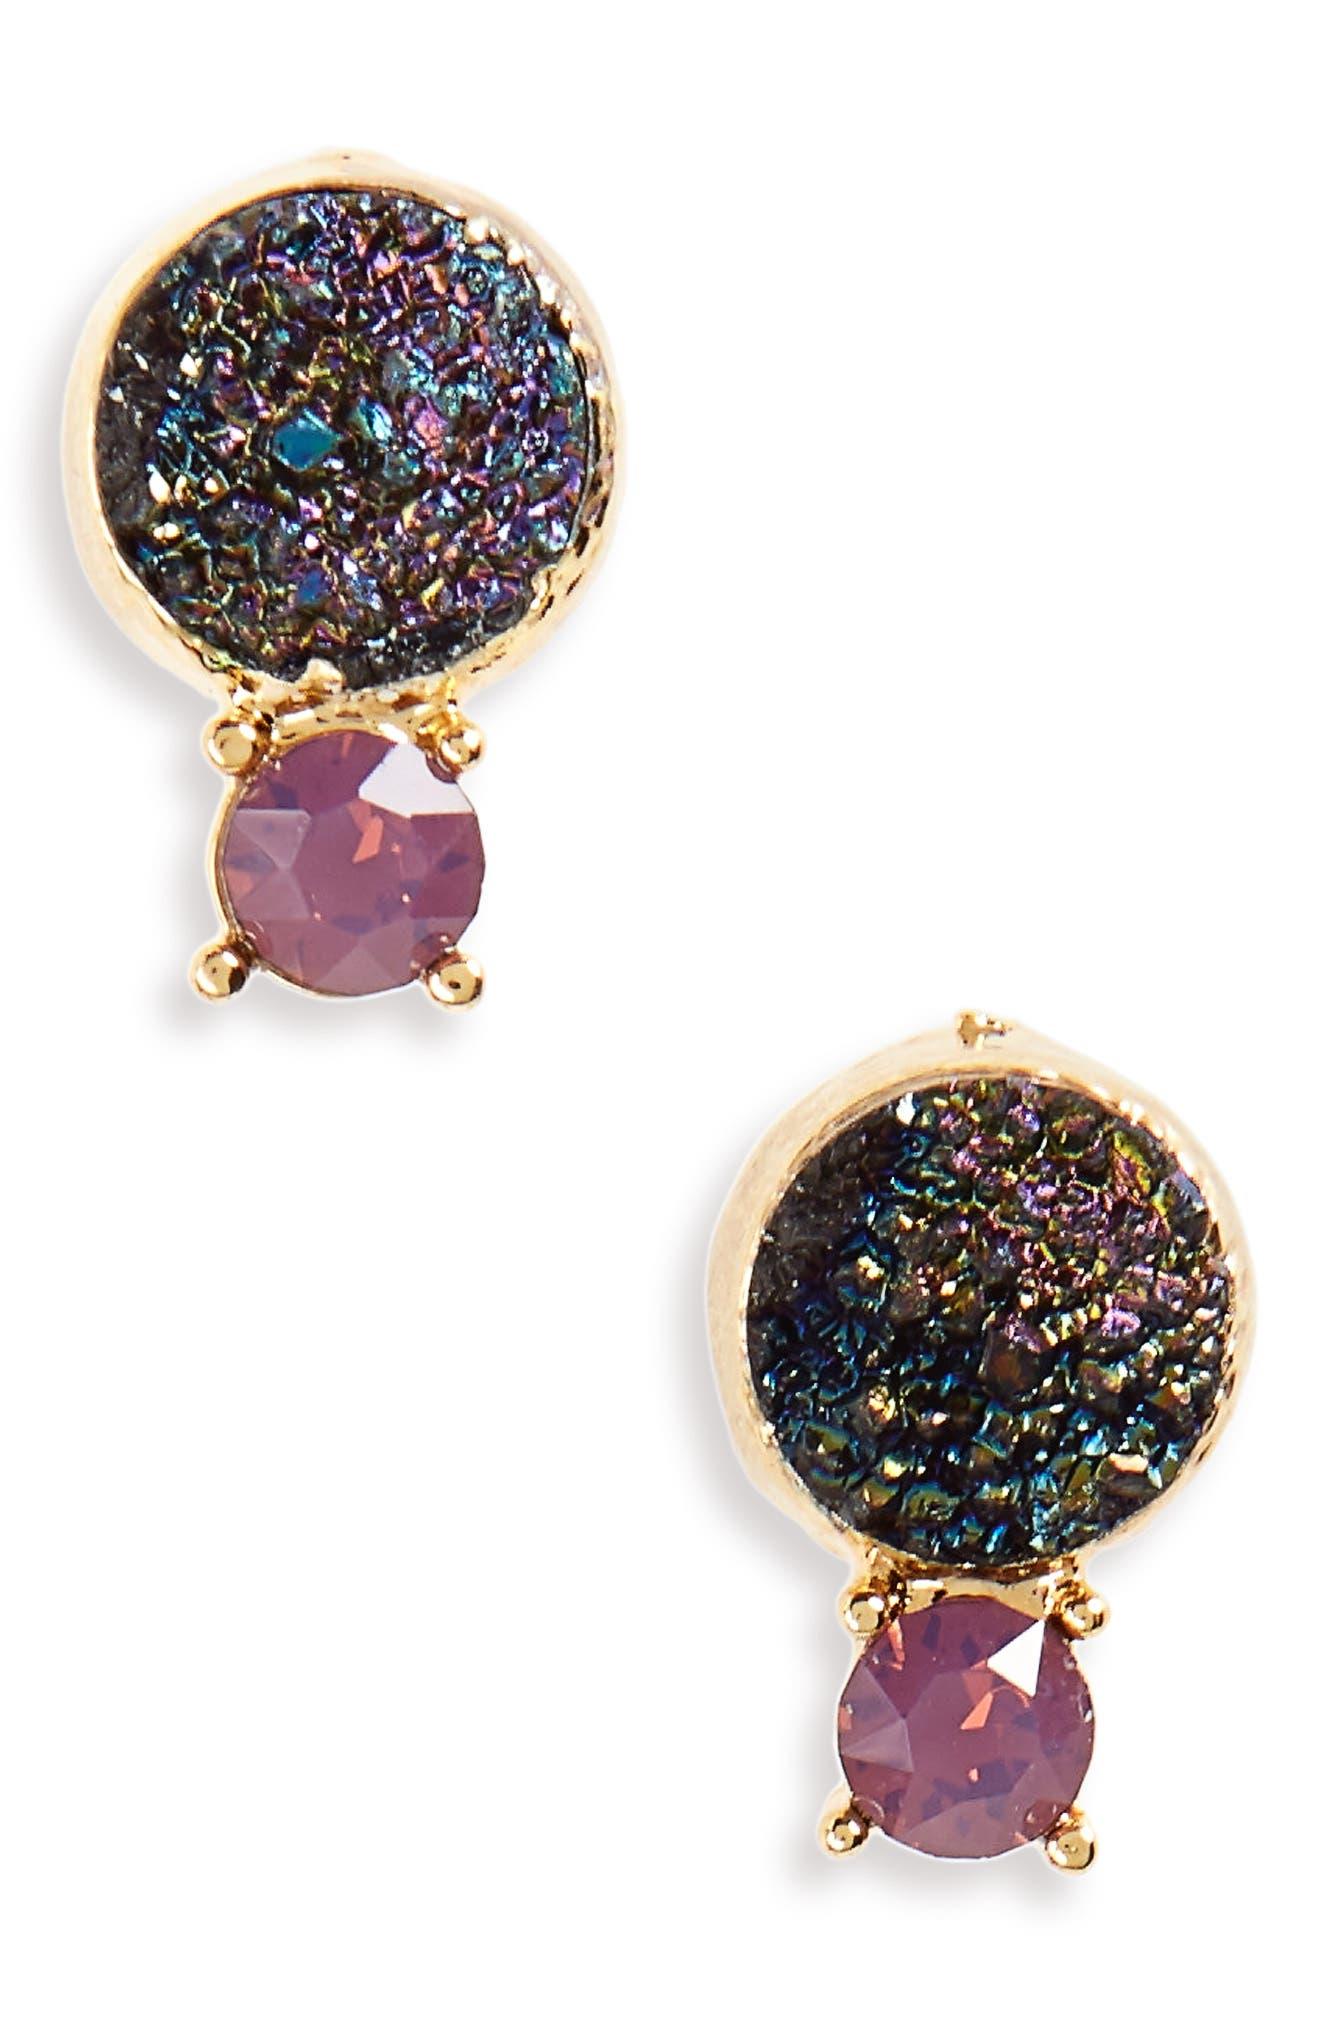 Crystal & Faux Drusy Stud Earrings,                         Main,                         color, Multi